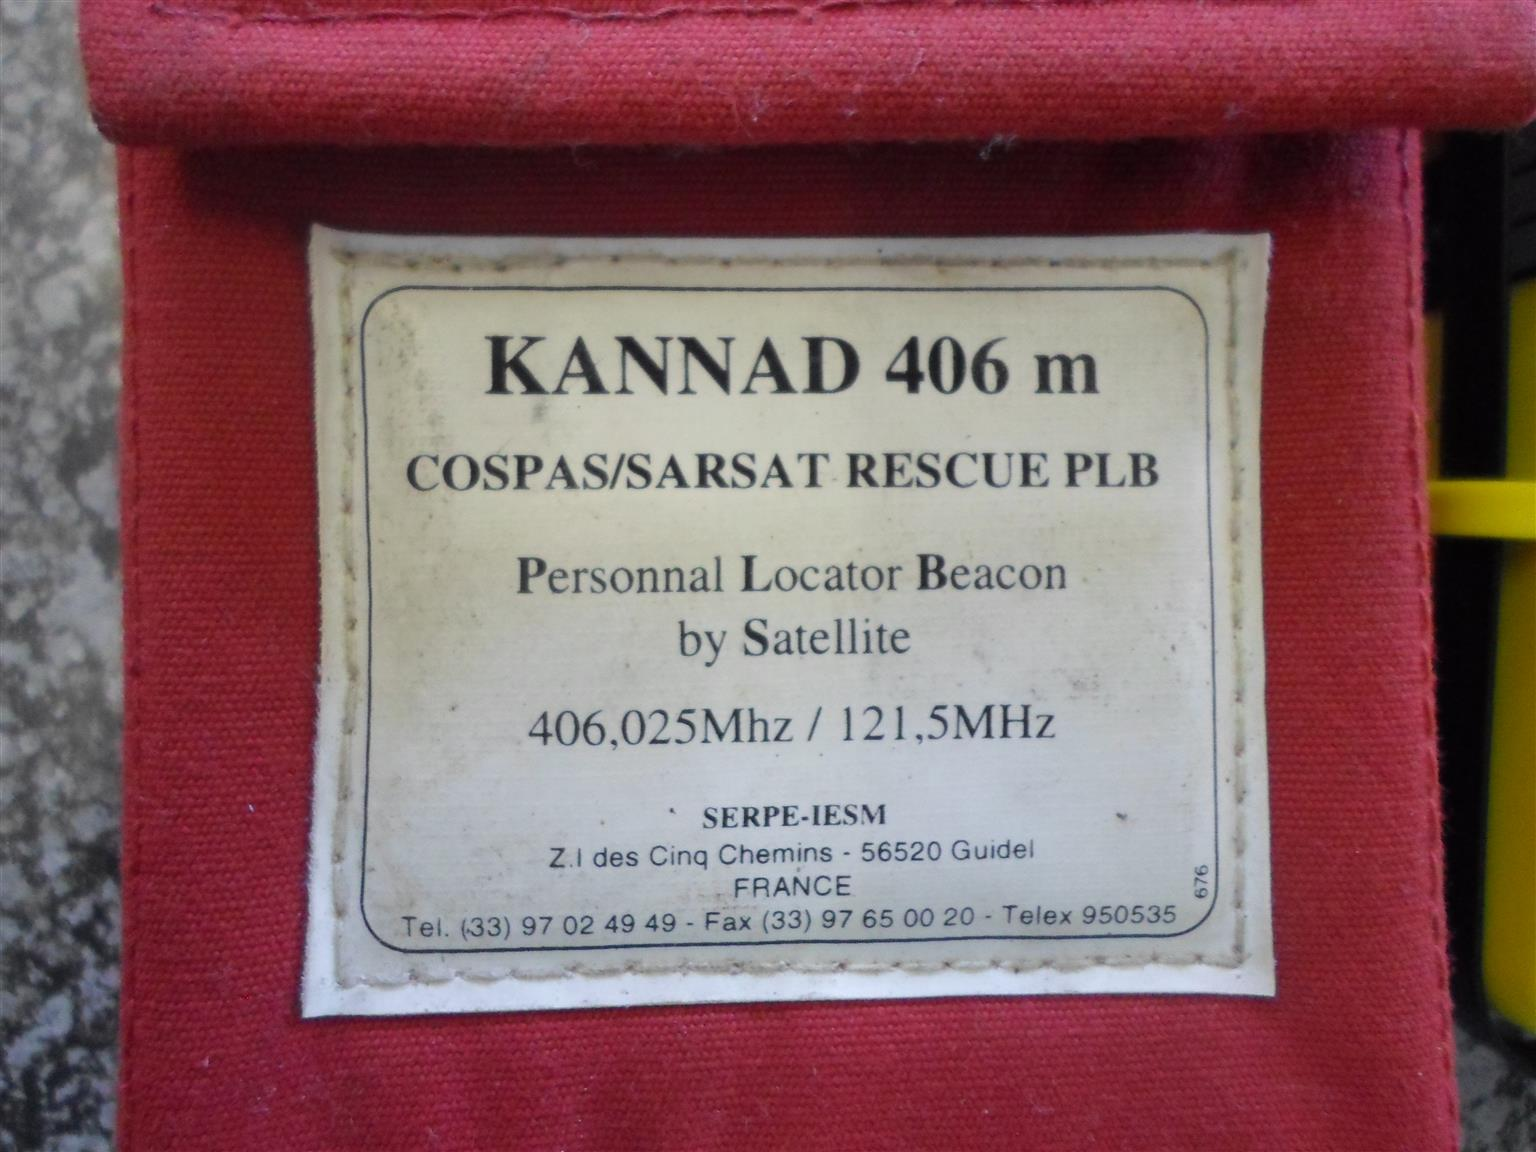 Kannad 406m Personnal Locator Beacon by Sattelite